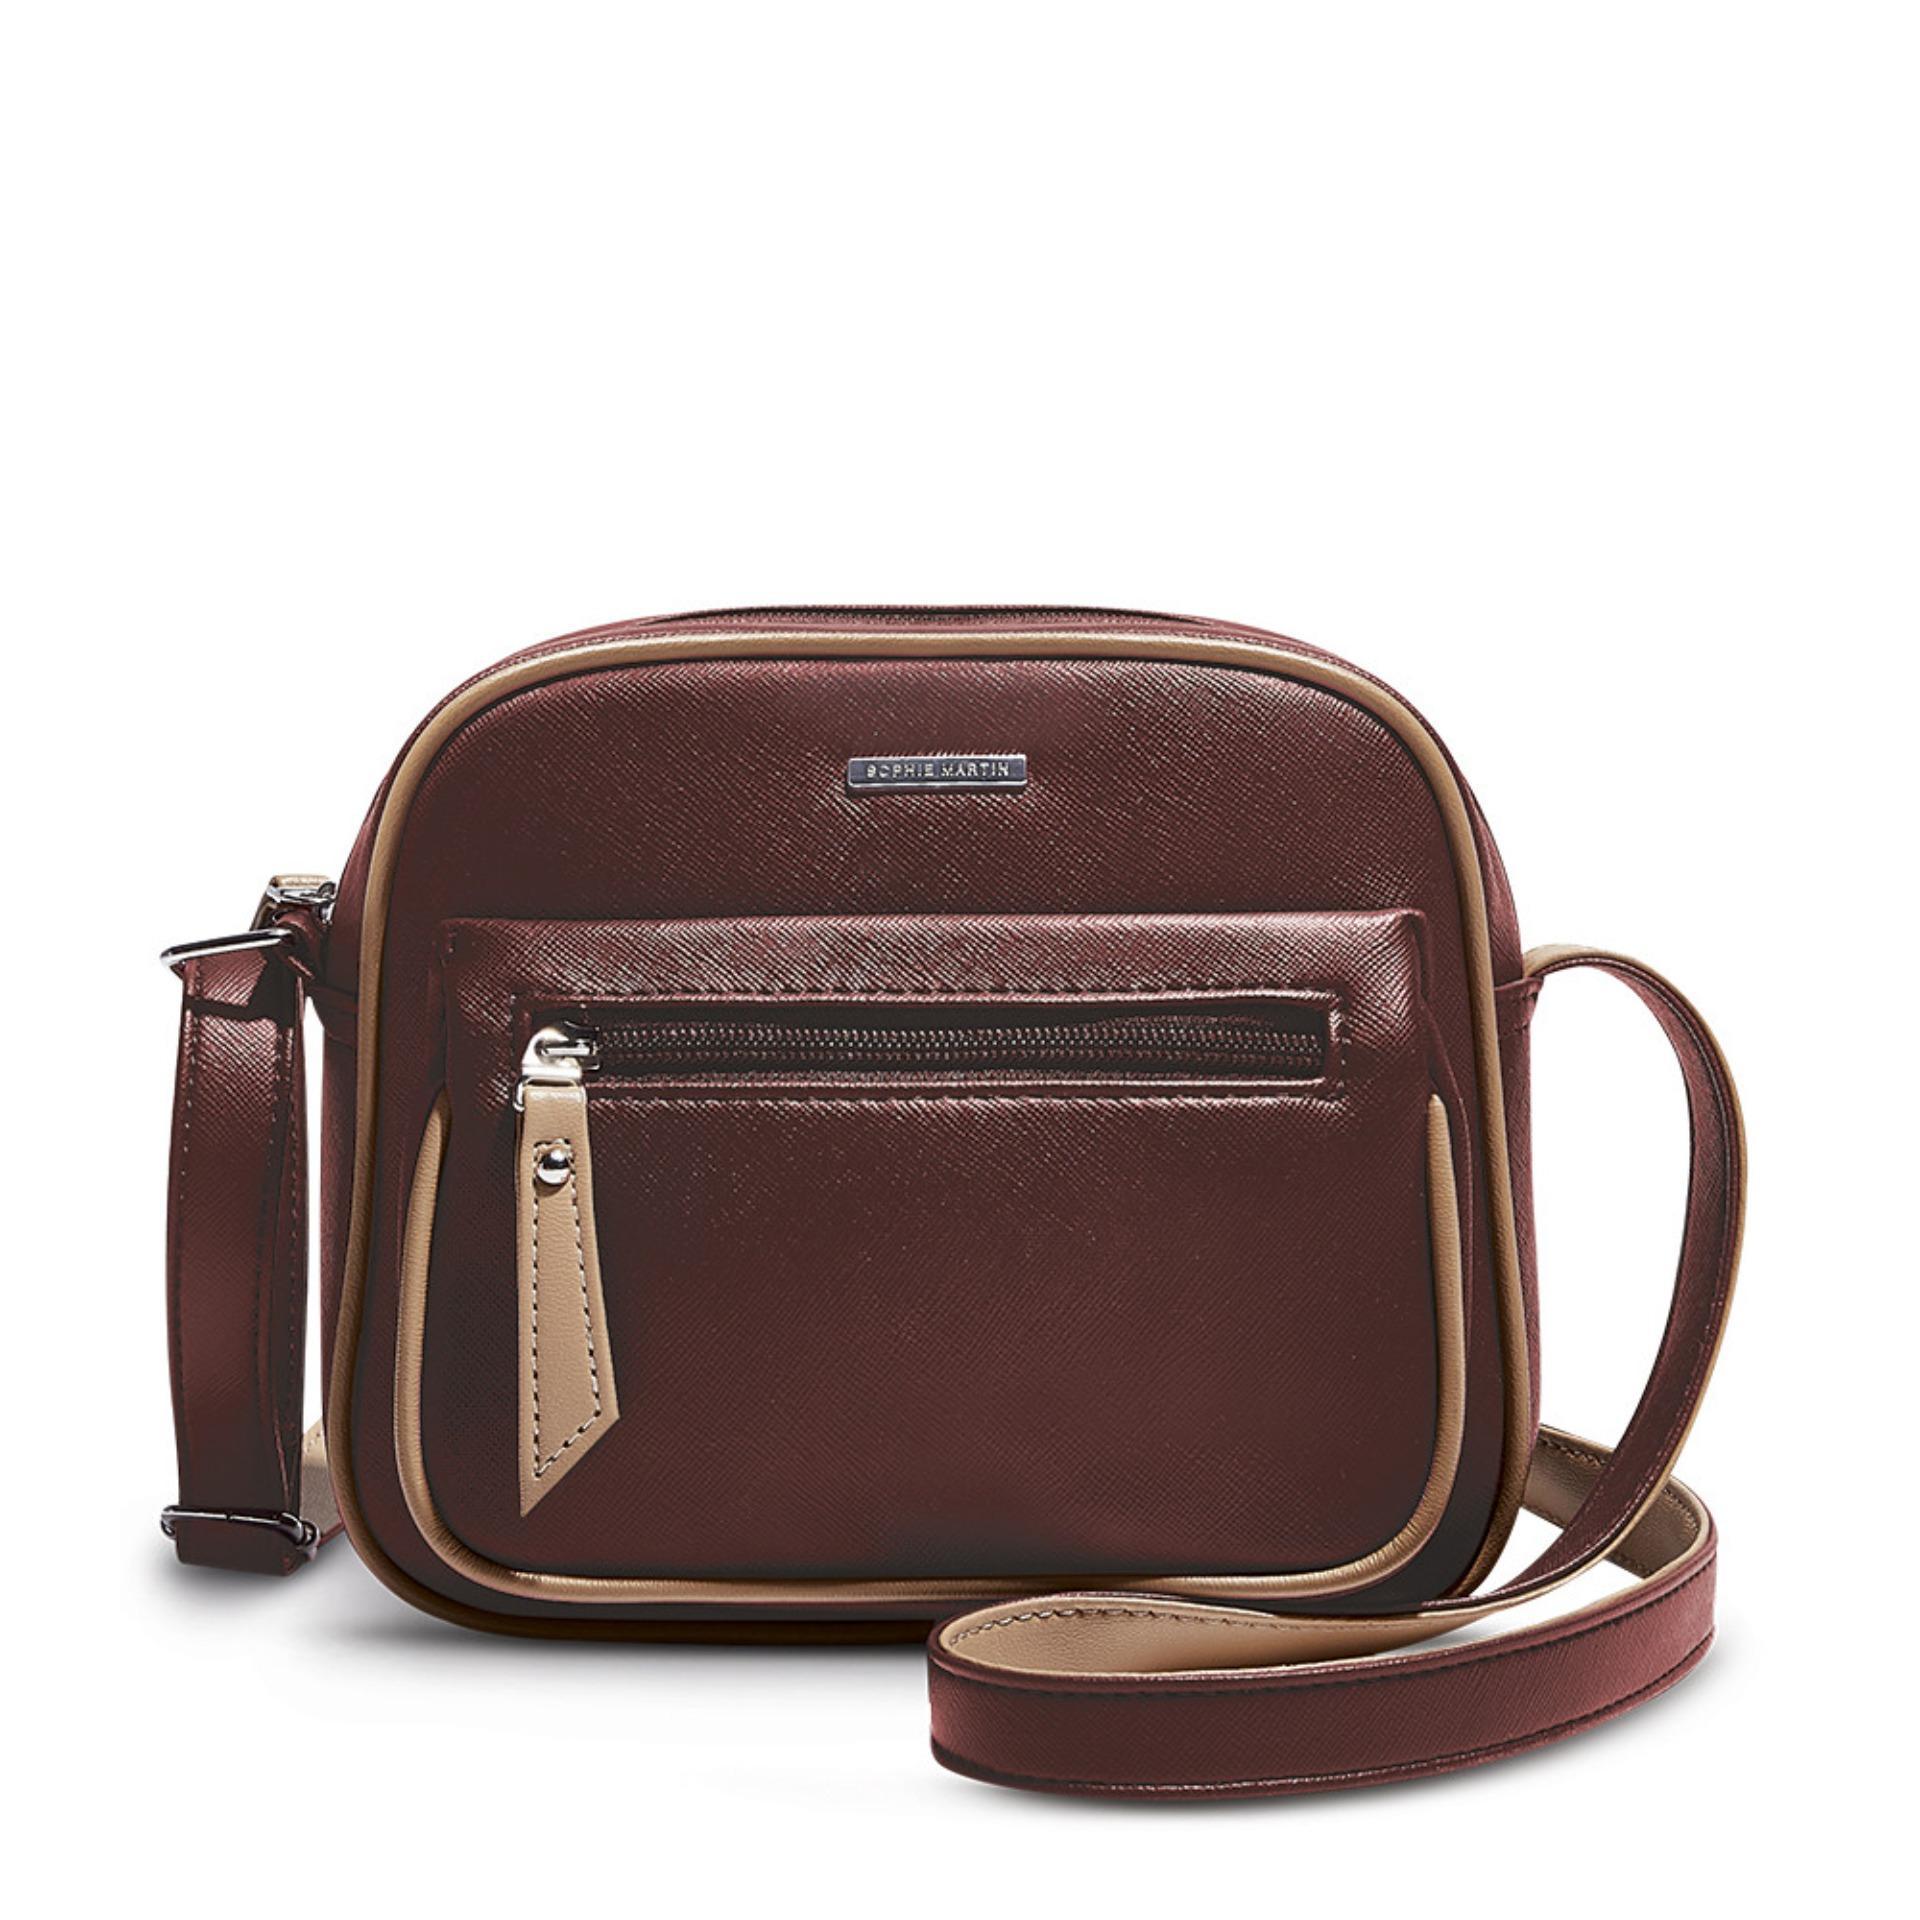 Review Sophie Paris Tas Selempang Wanita Import Branded Rosalba Bag Hana Ahphbu Cielo T4321b8 Burgundy